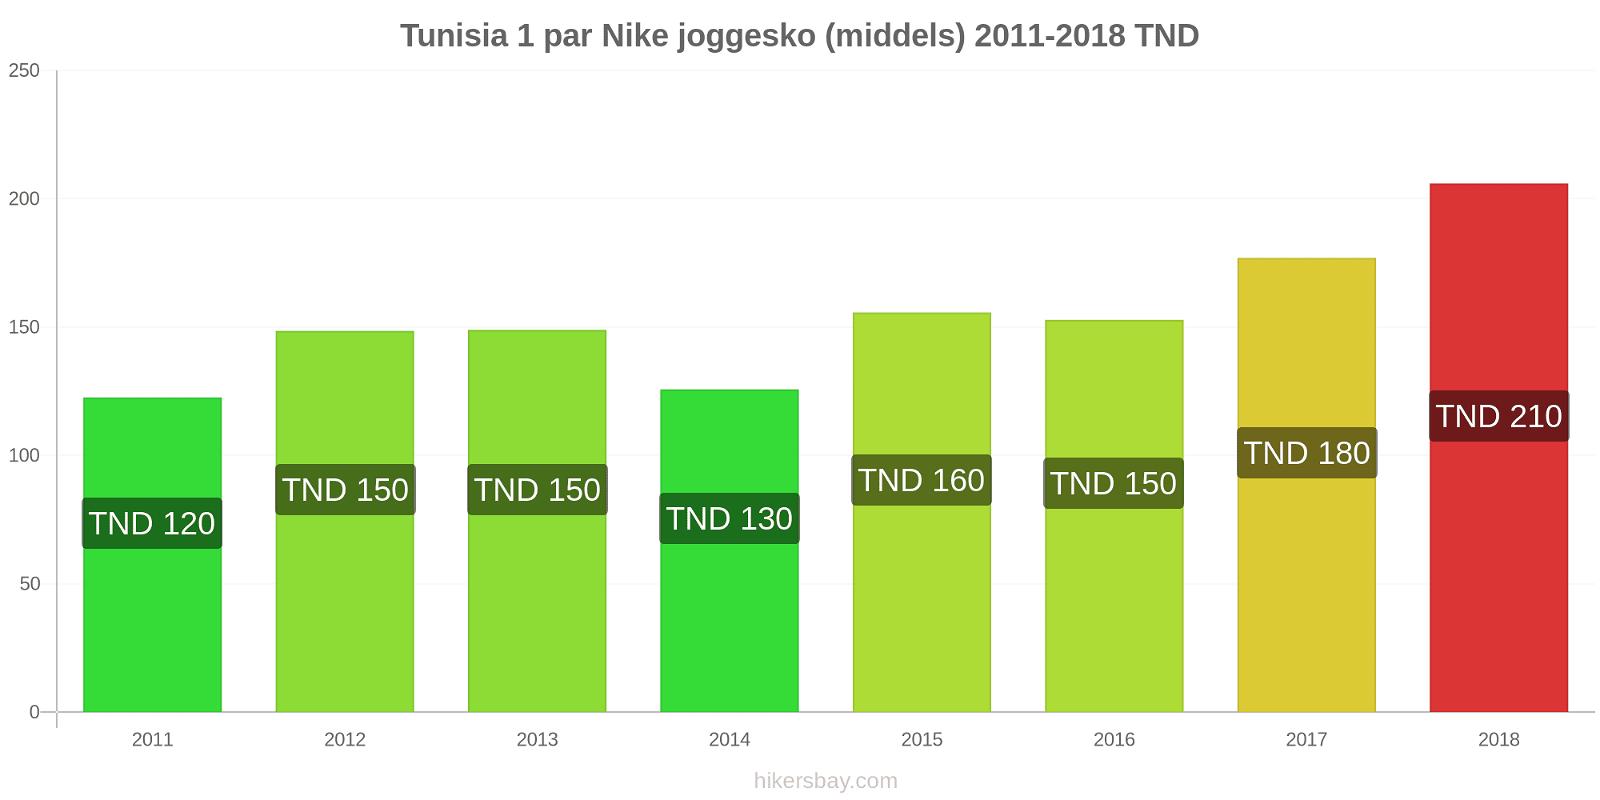 Tunisia prisendringer 1 par Nike joggesko (middels) hikersbay.com